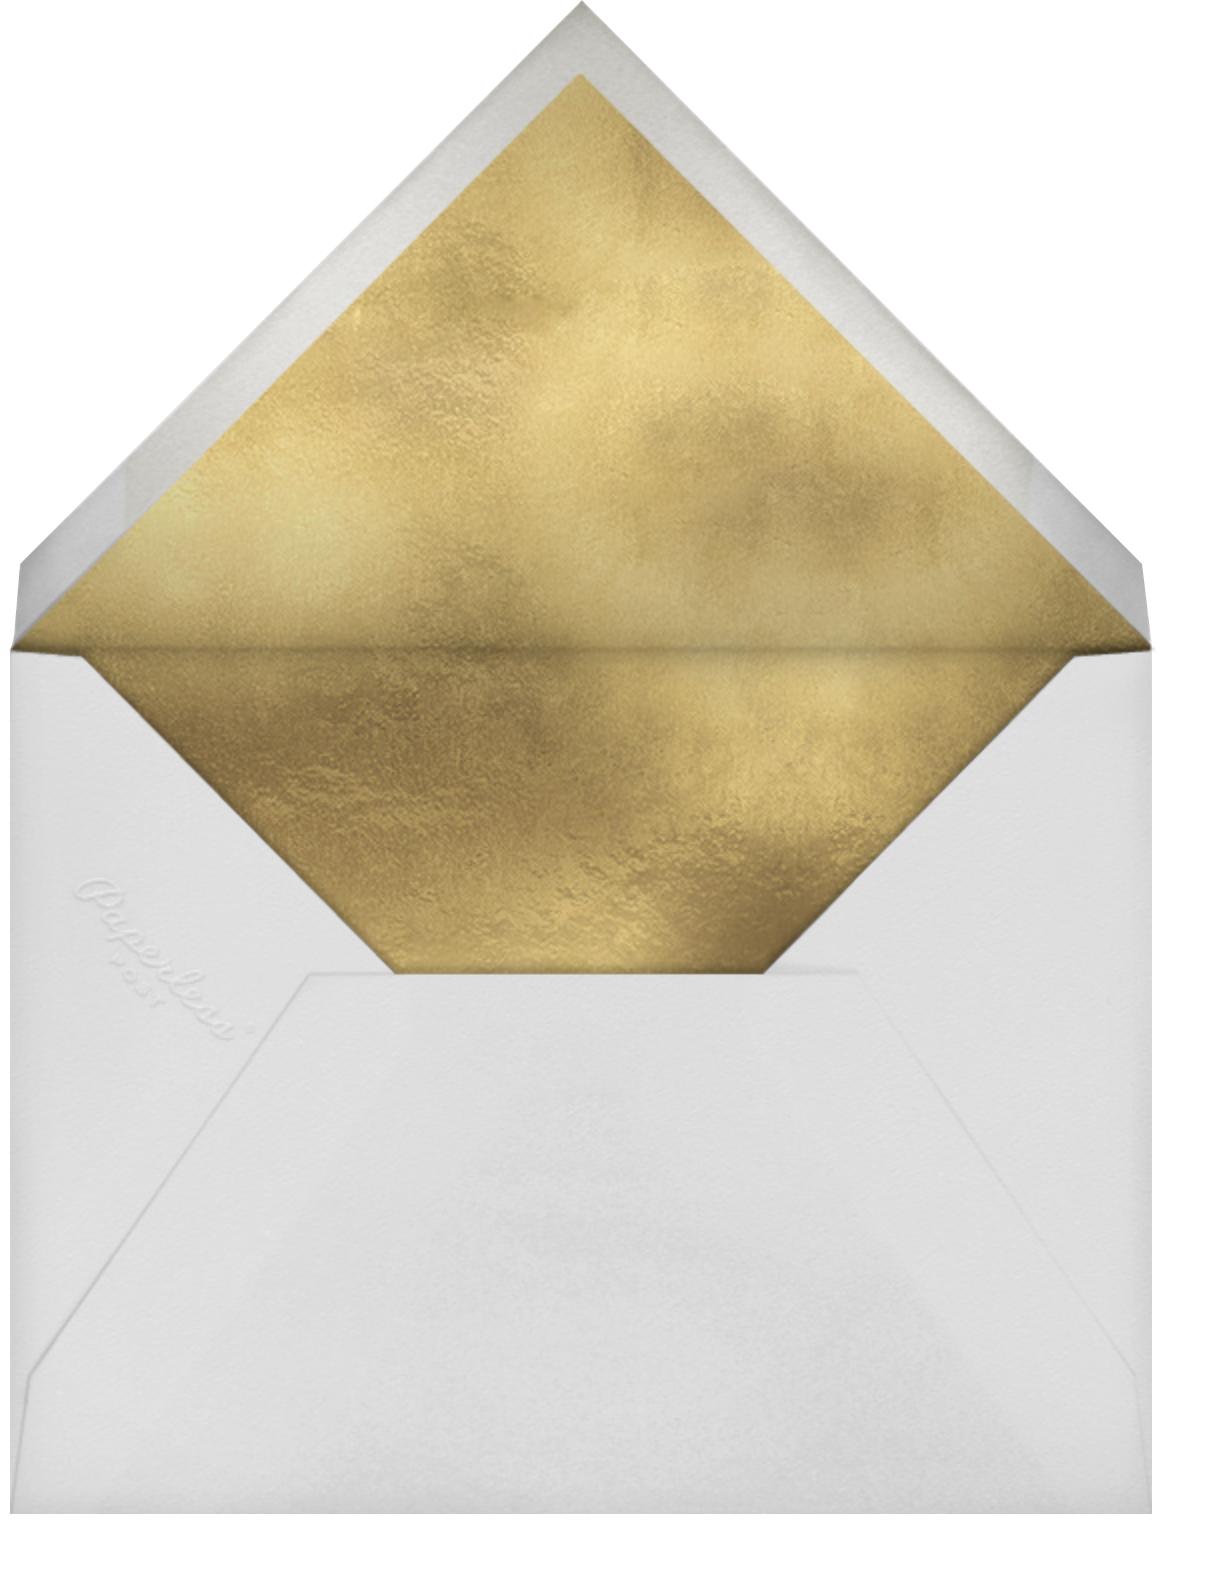 Sky Lights - Sugar Paper - Christmas party - envelope back